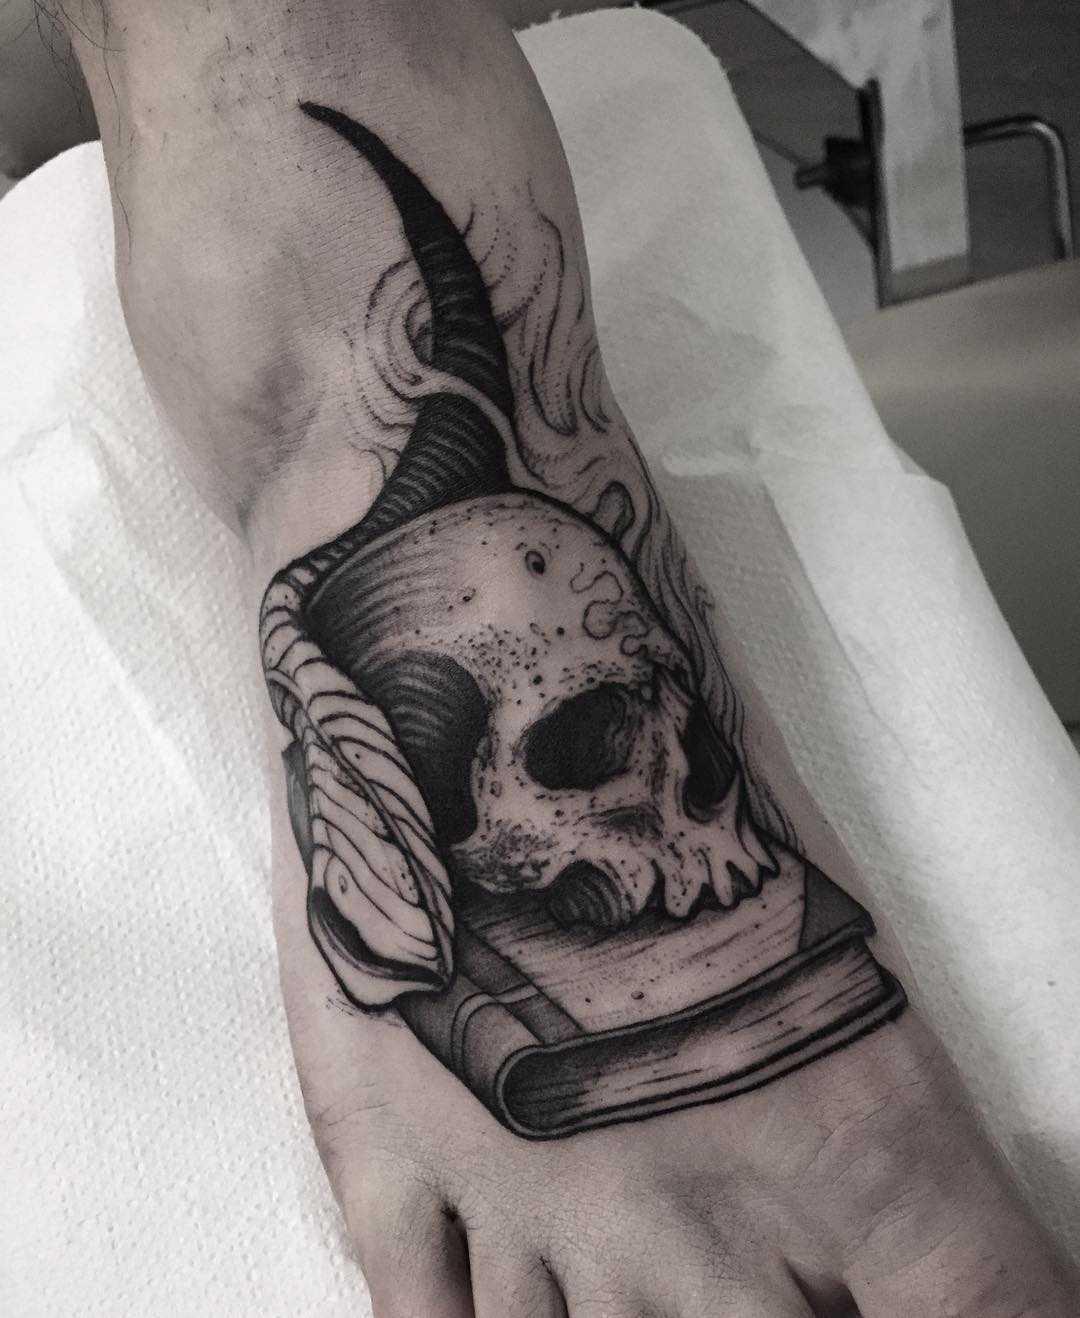 Occult Tattoo On The Foot Tattoogrid Net